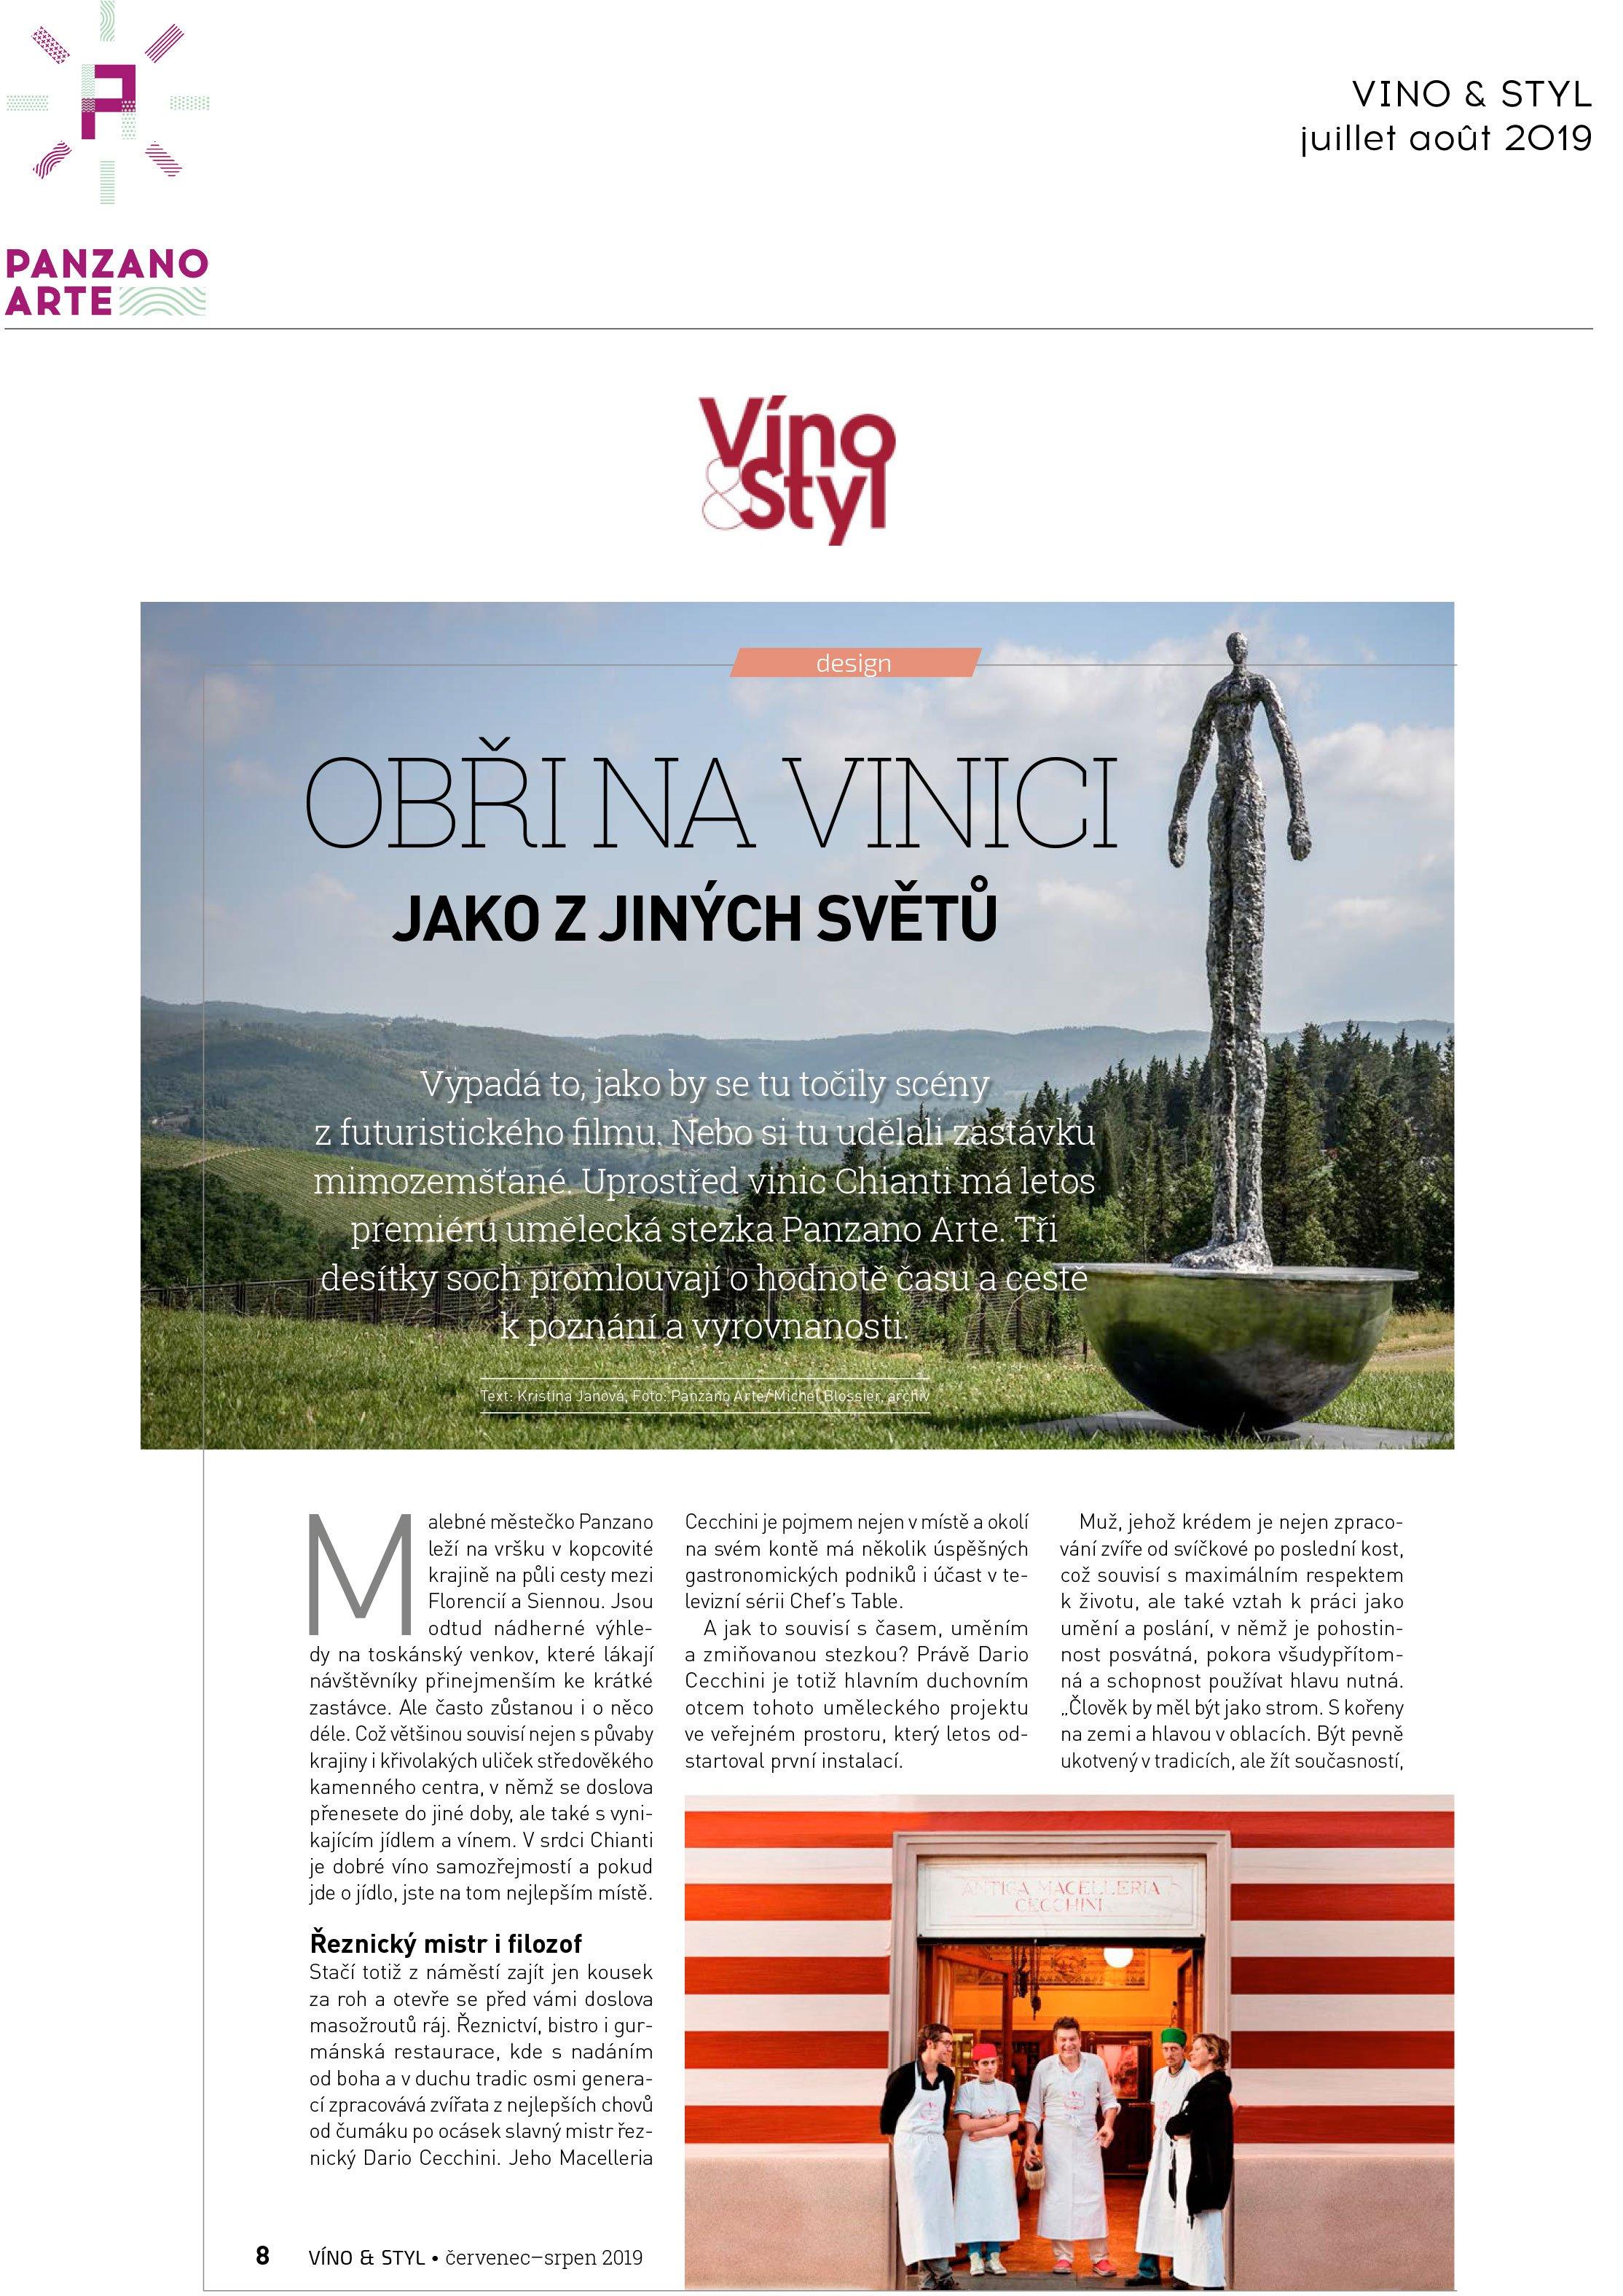 Vino&Styl<br>July/August 2019